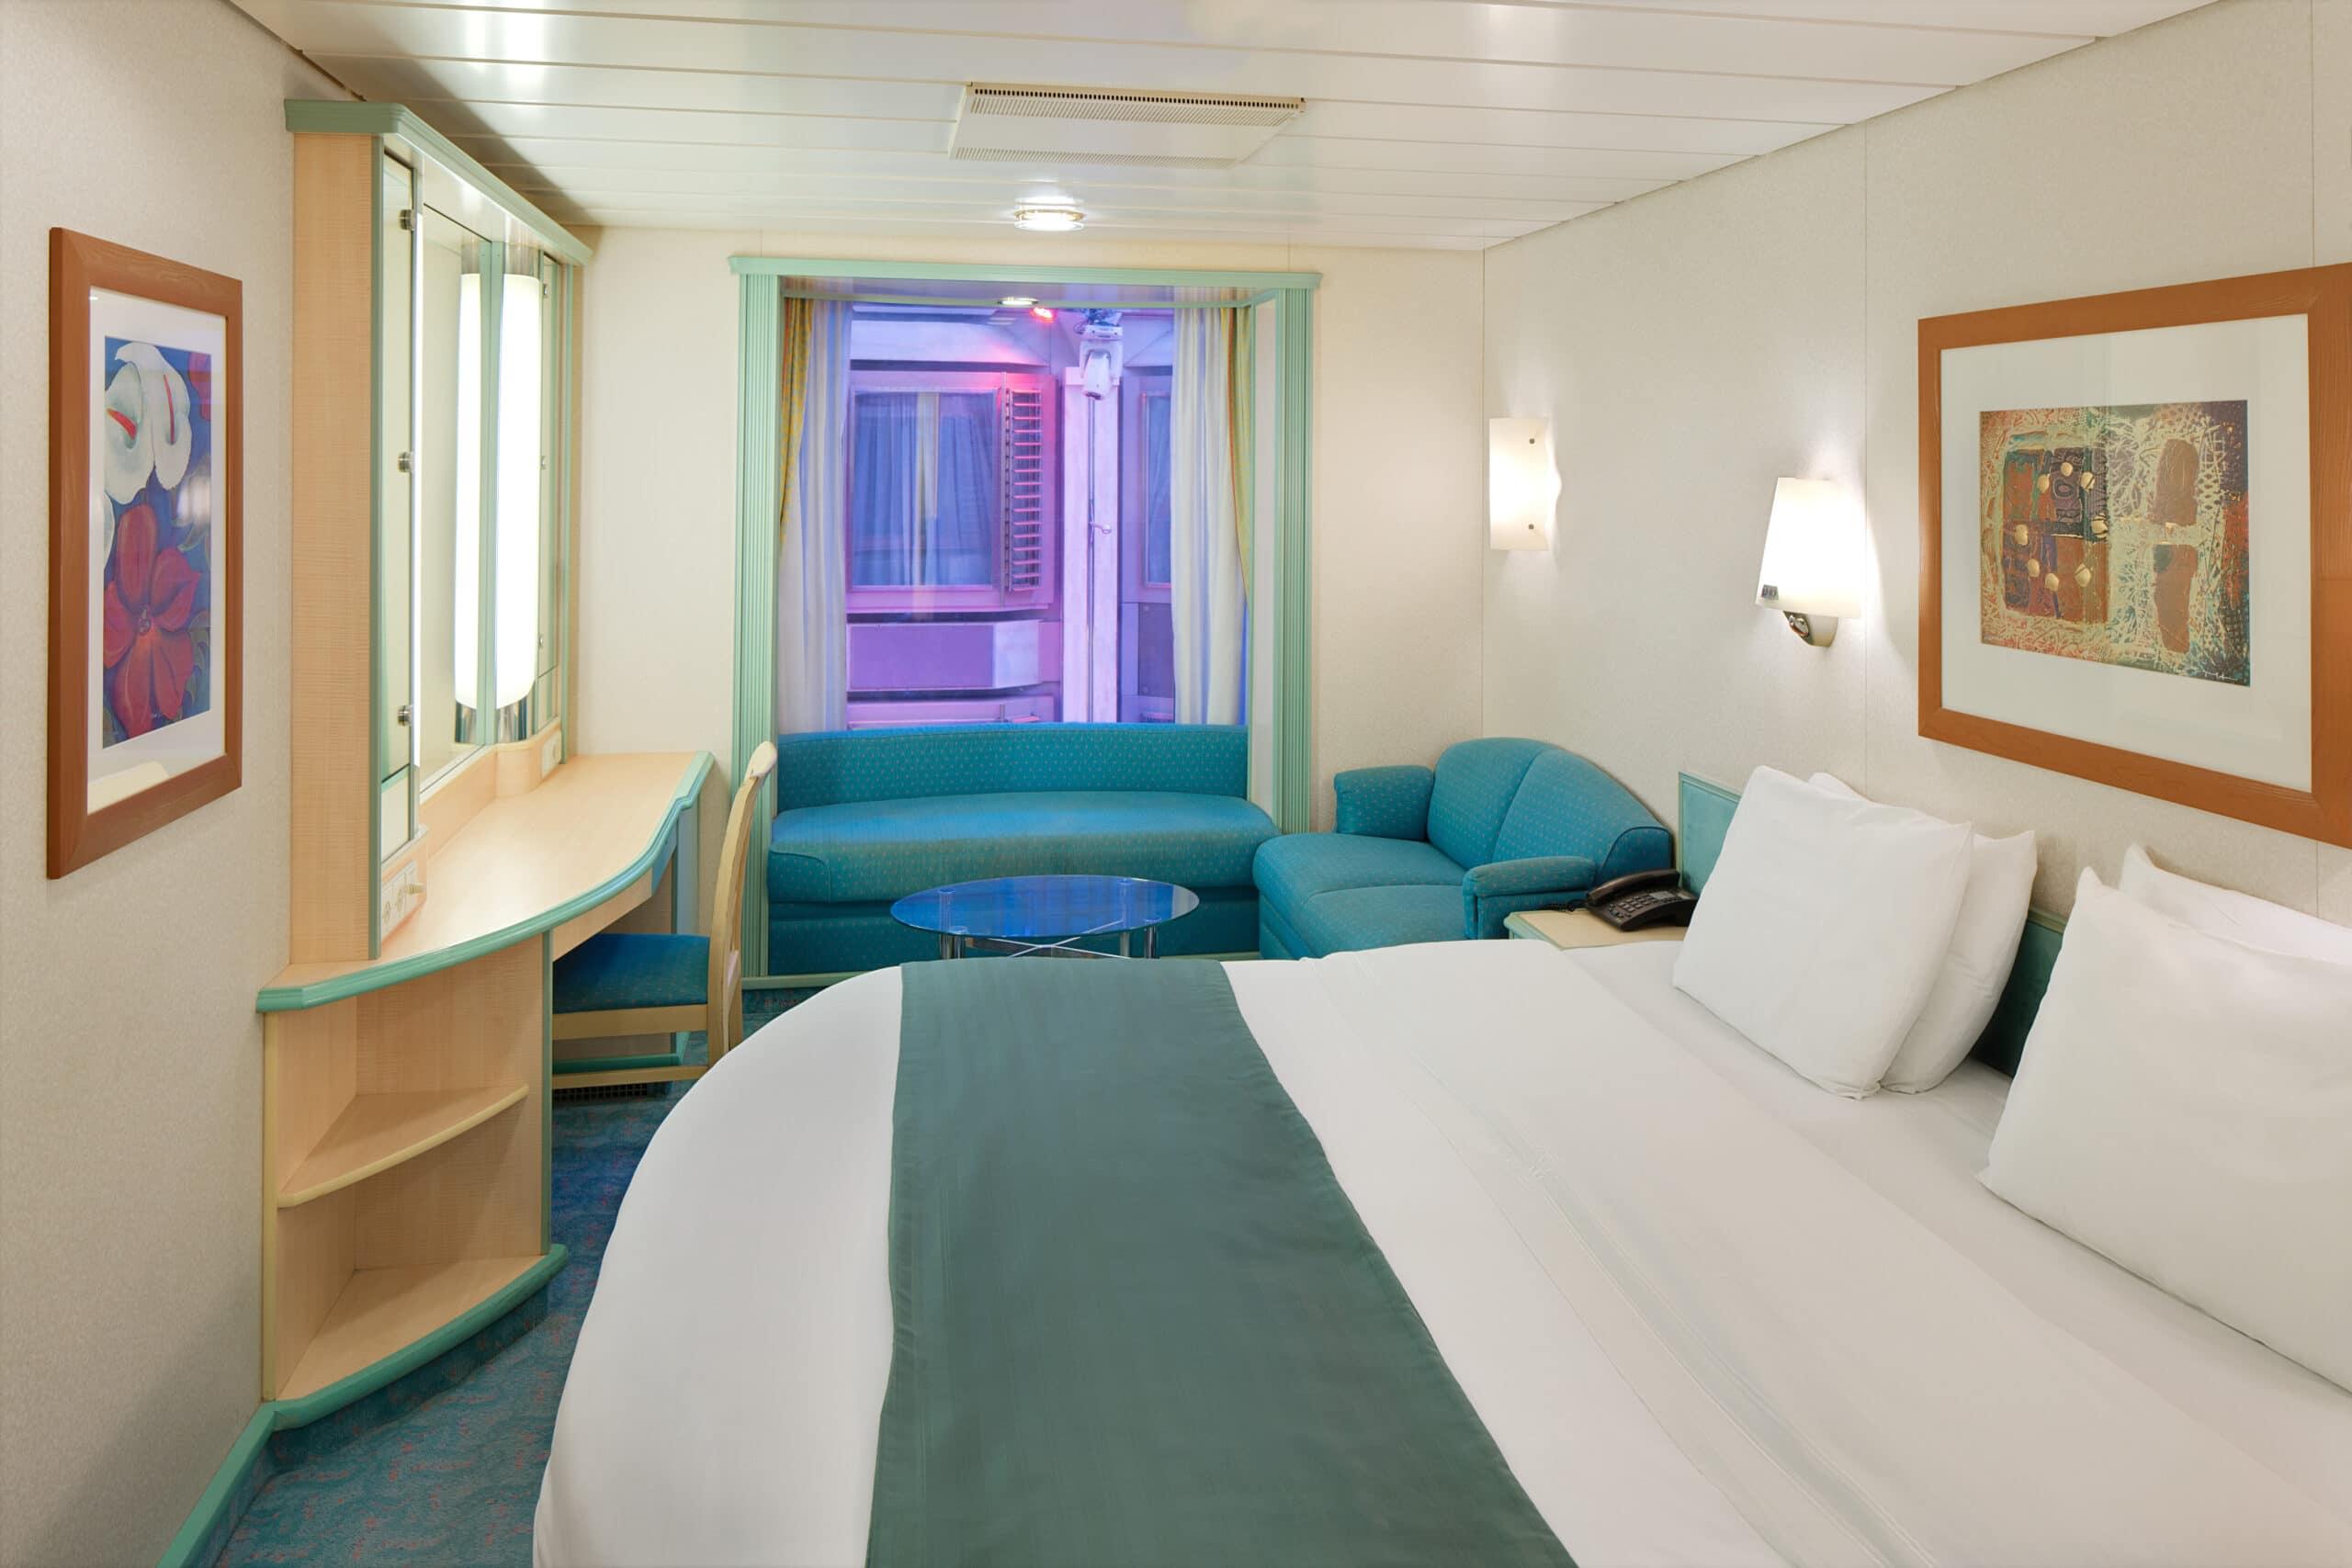 Royal-Caribbean-International-Explore-of-the-Seas-Mariner-of-the-Seas-schip-cruiseschip-categorie-2T